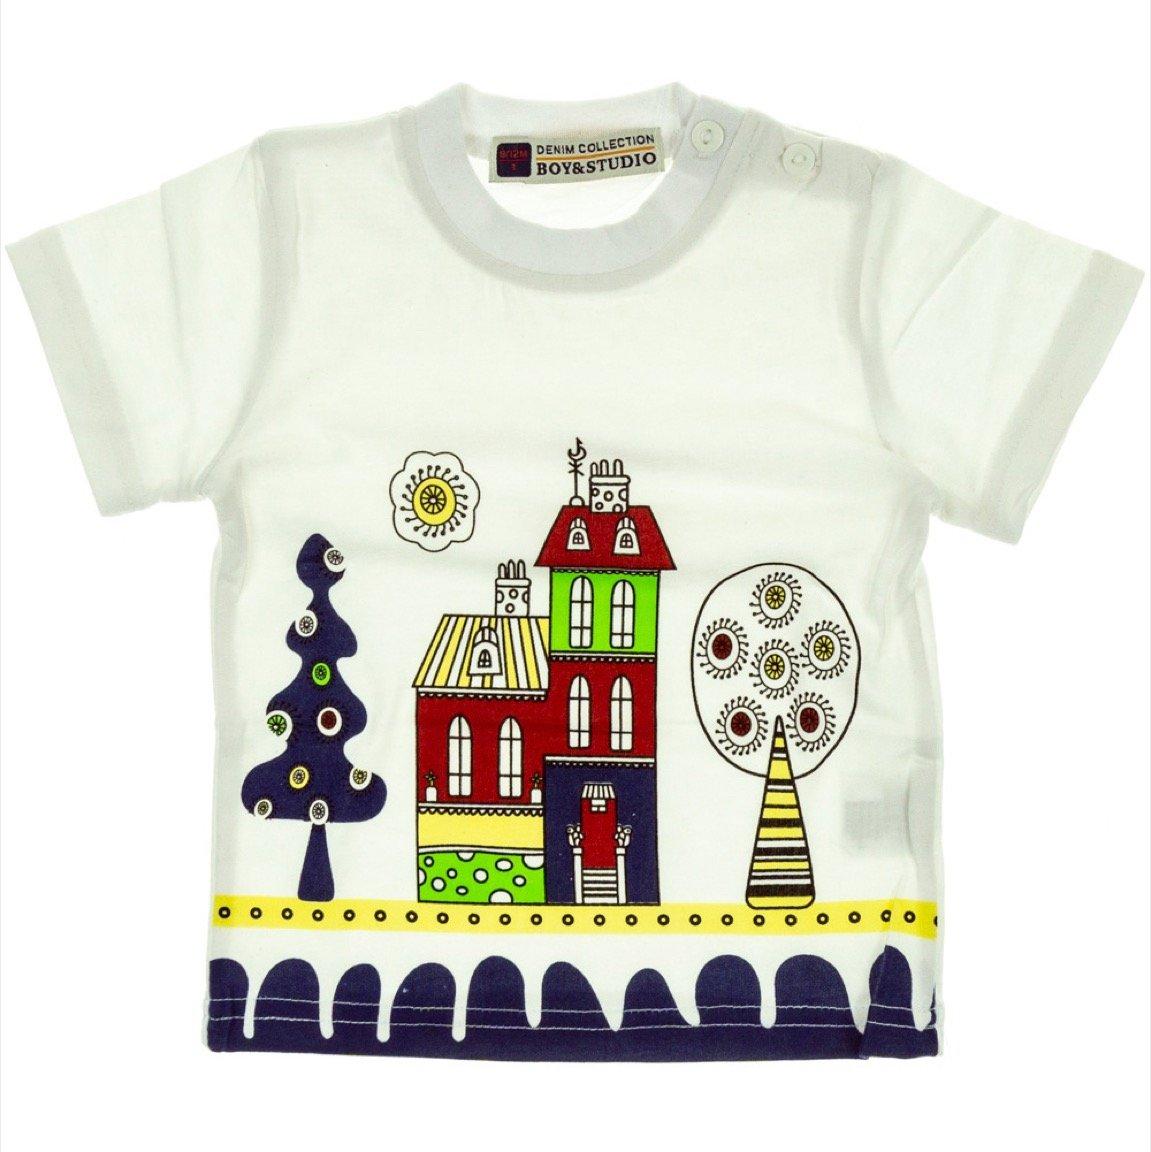 Boy & Studio παιδική μπλούζα «White City»